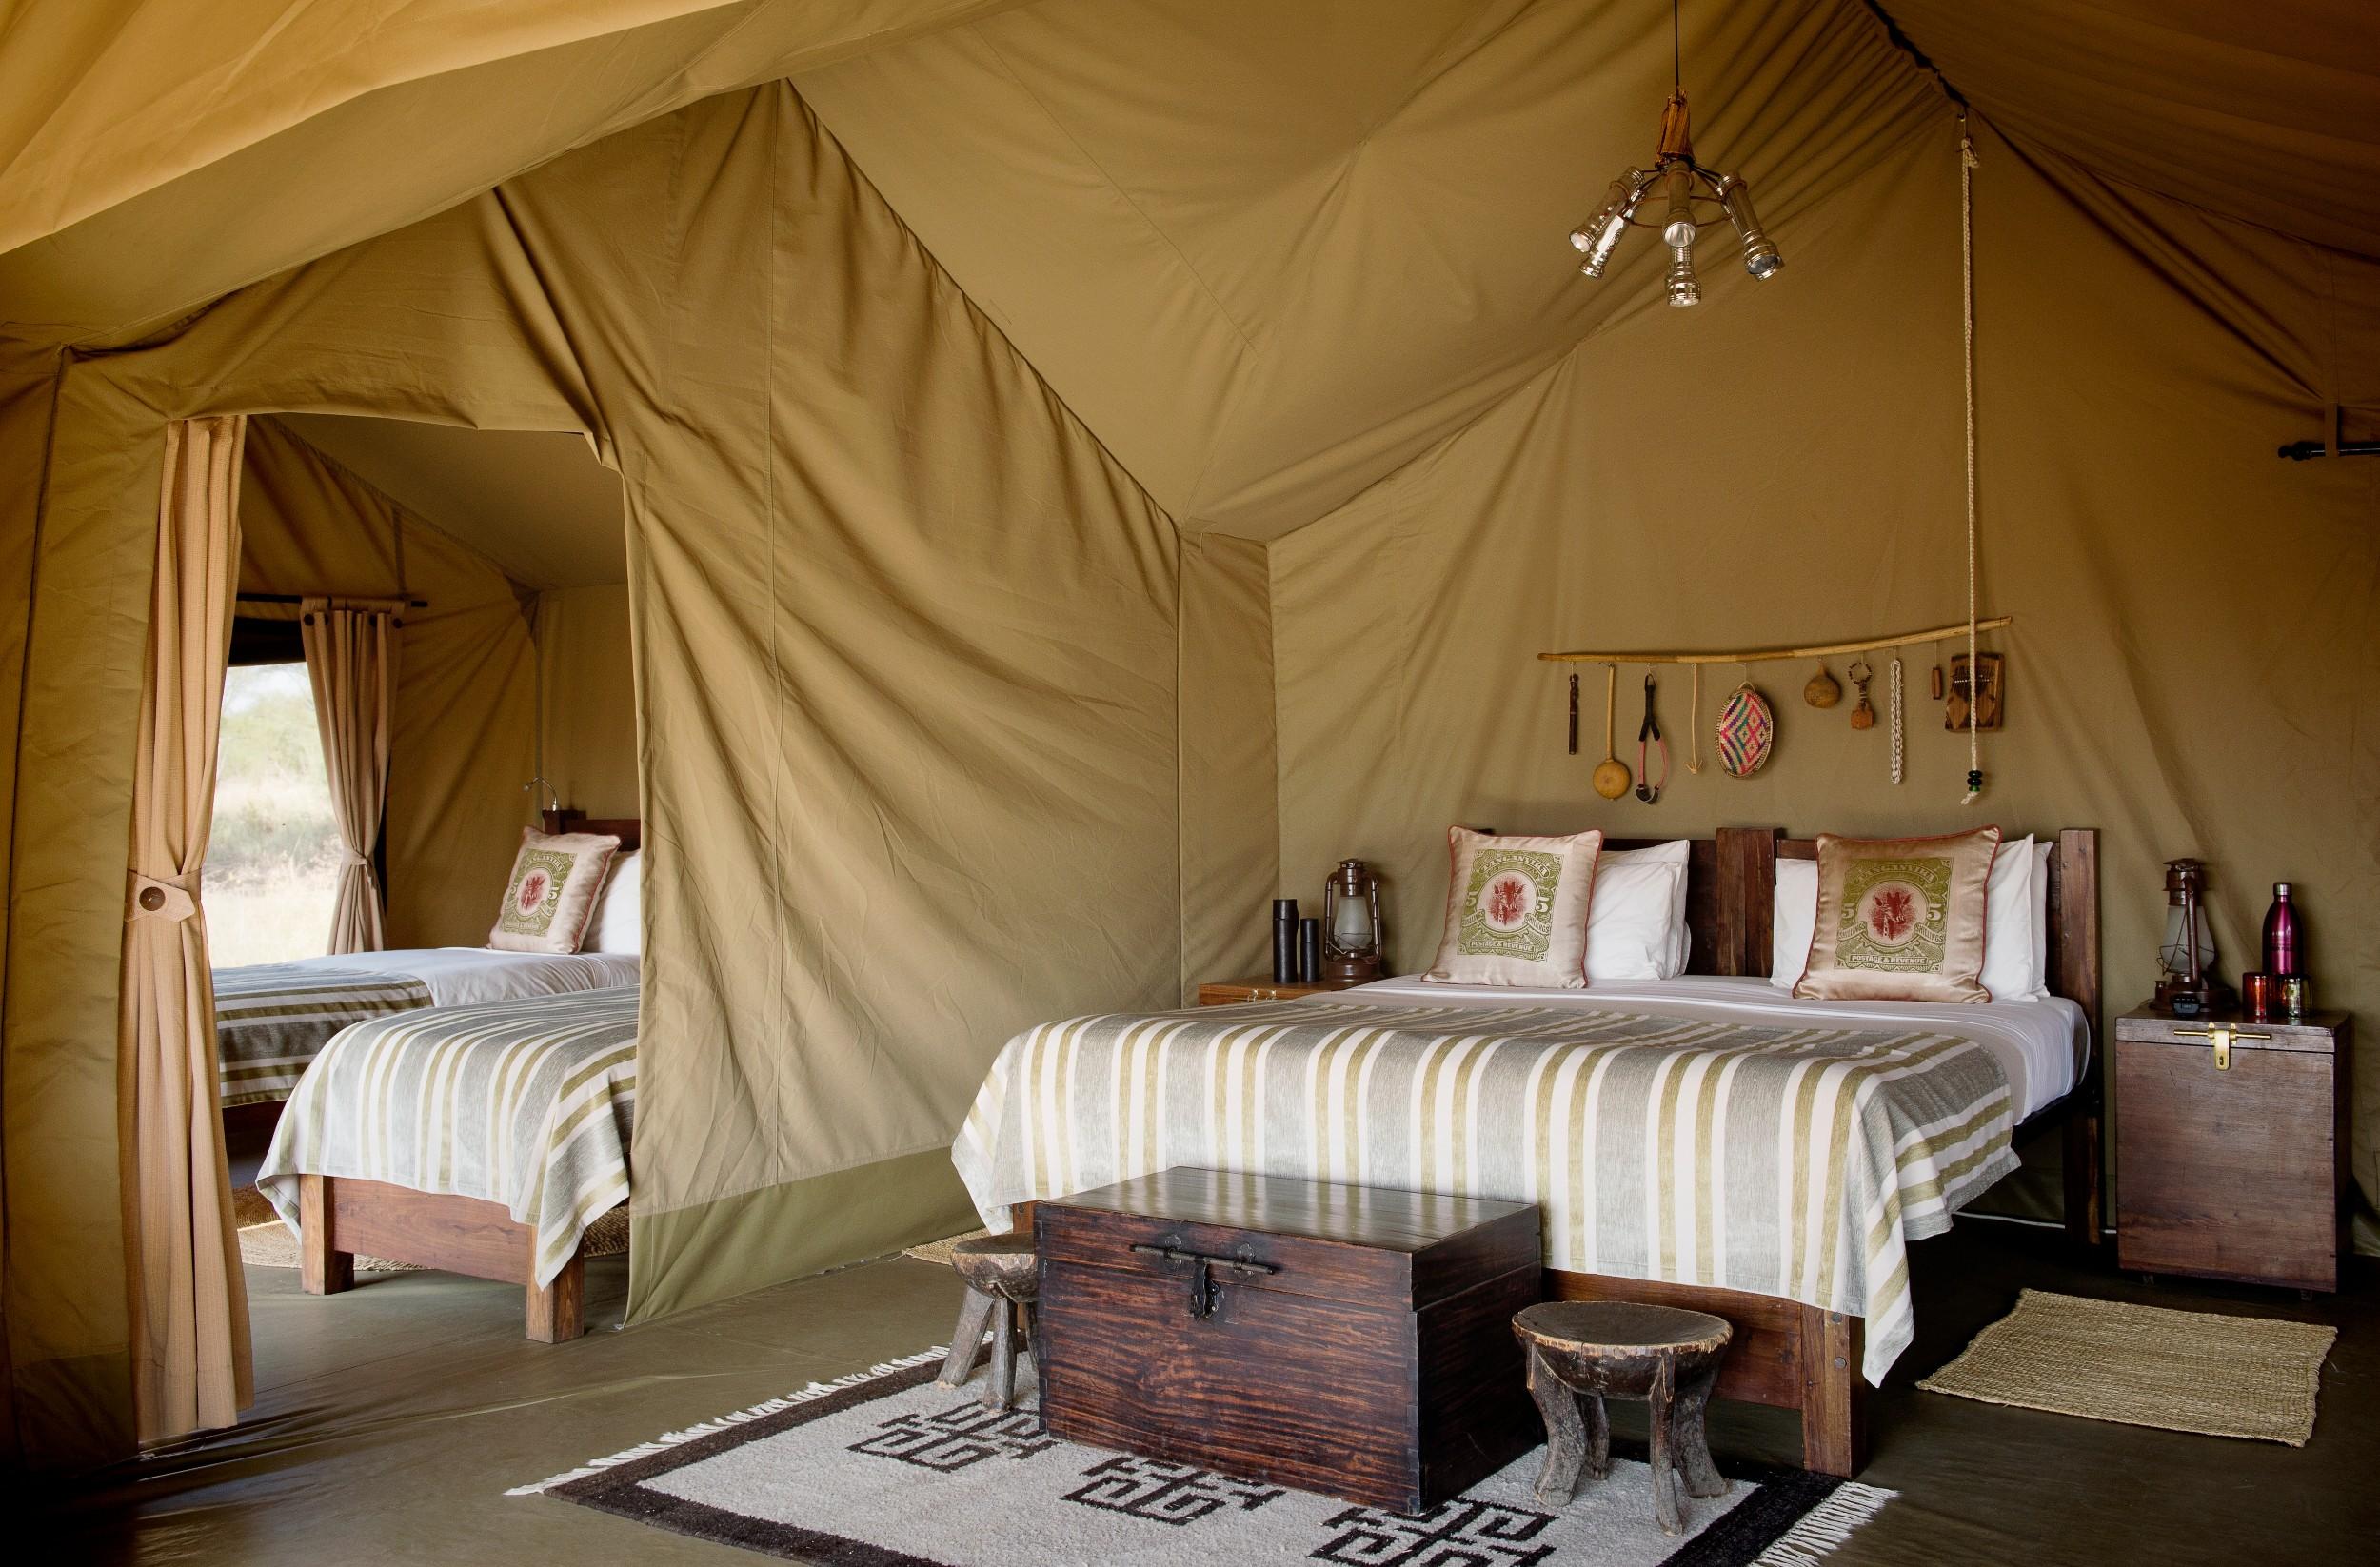 Dunia-Camp-guest-tent-bedroom-Eliza-Deacon-HR.jpg